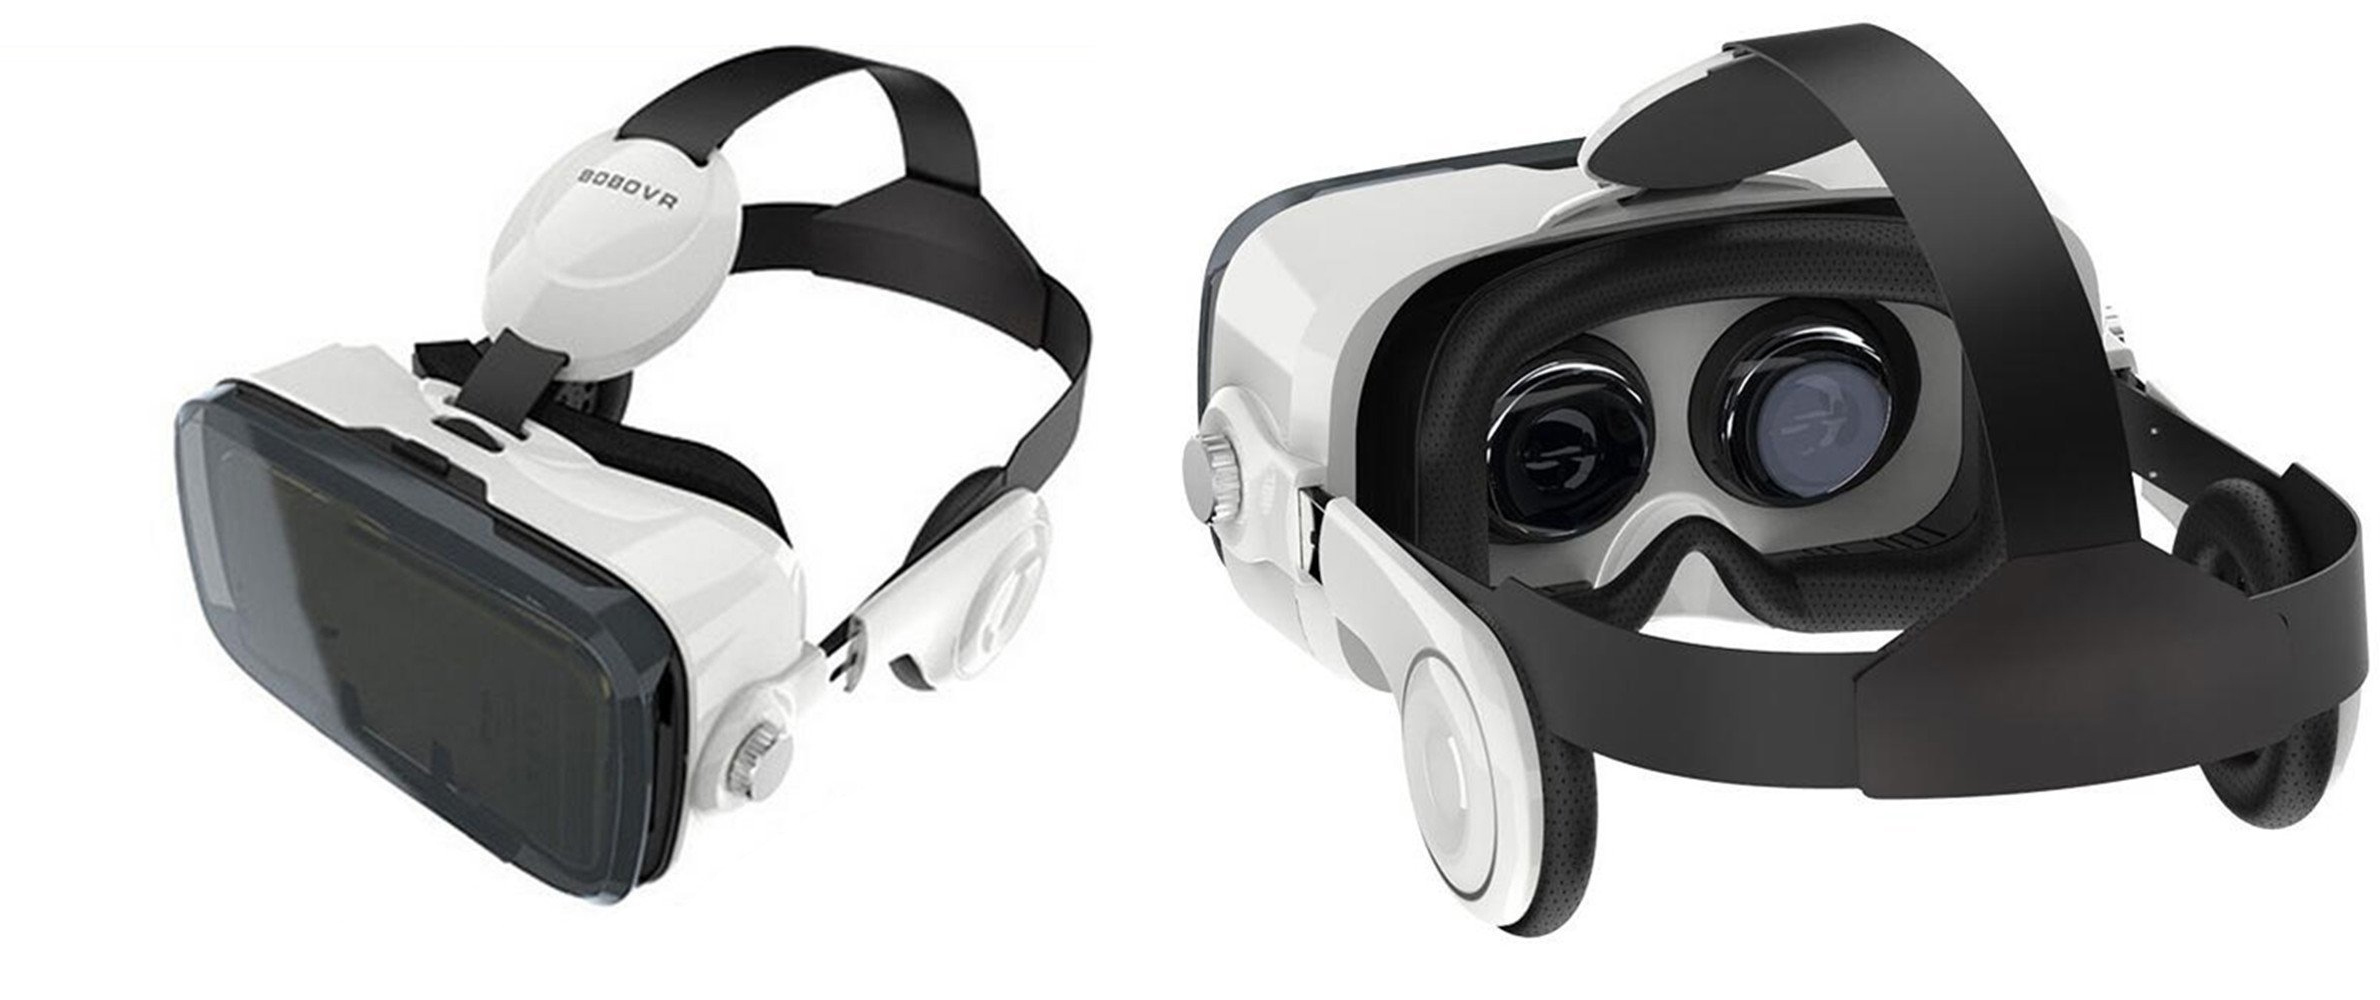 best vr set 2016 JEQEYA VR Headset